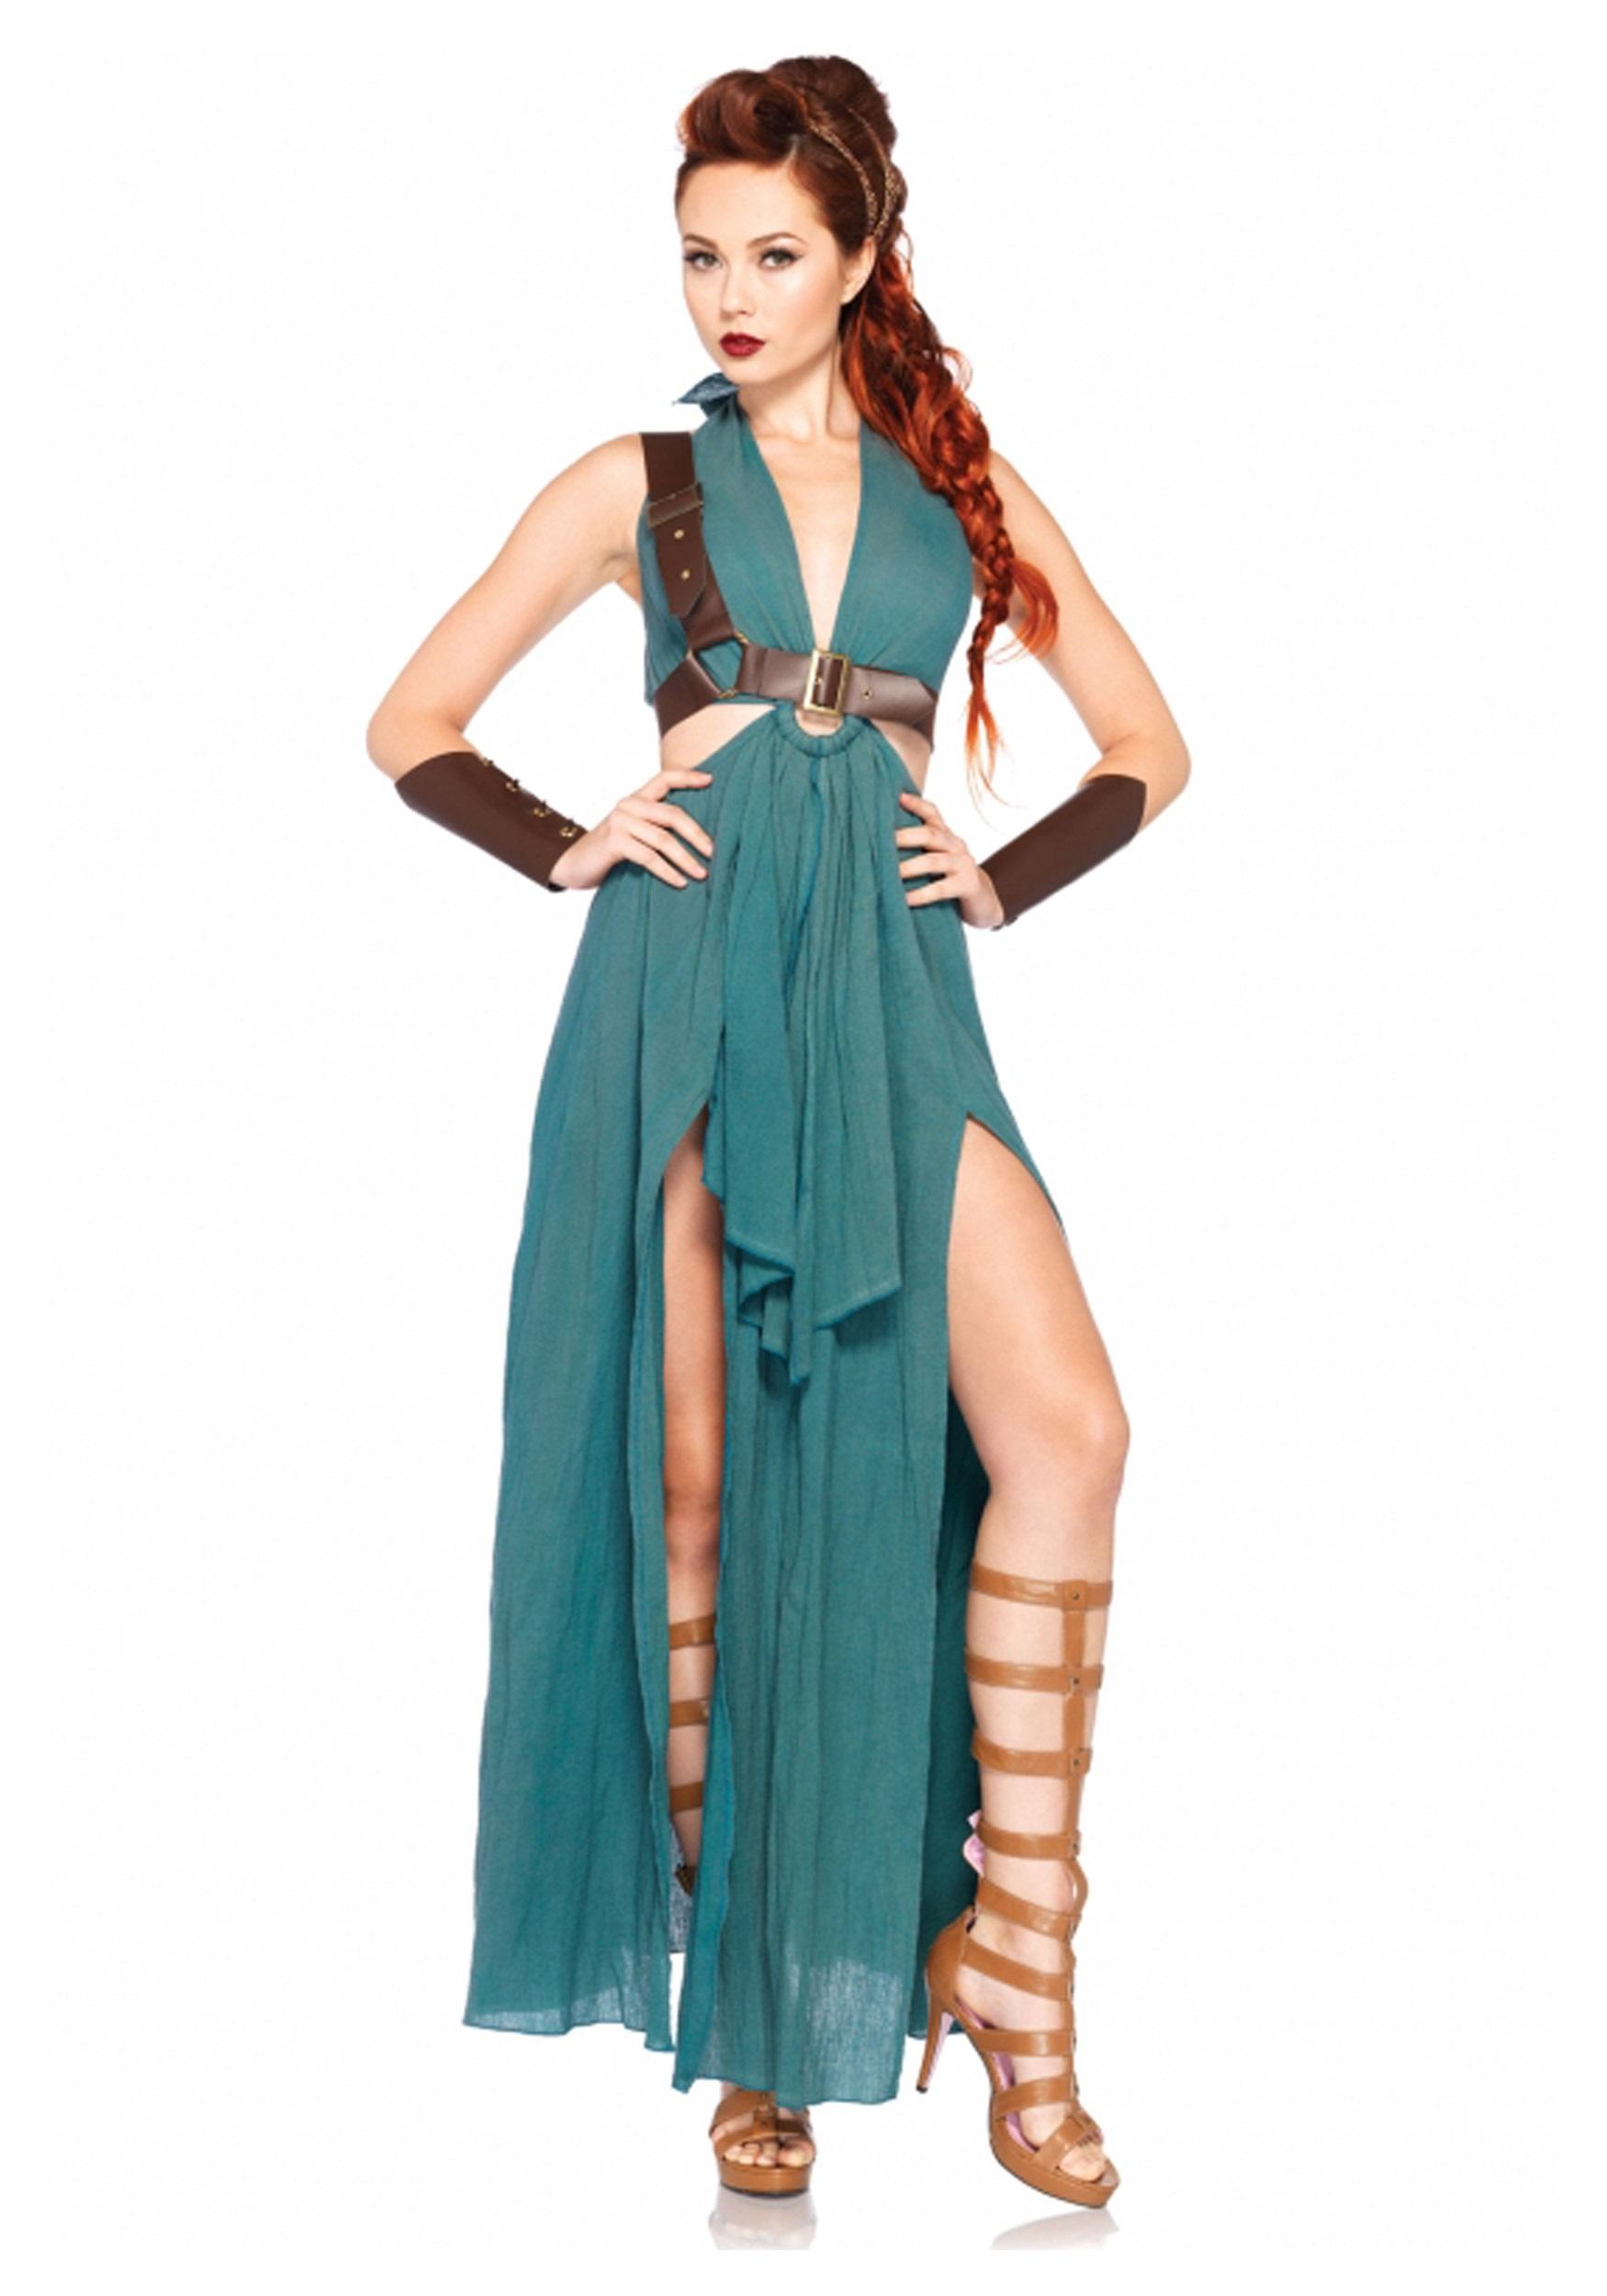 Women's Warrior Maiden Costume